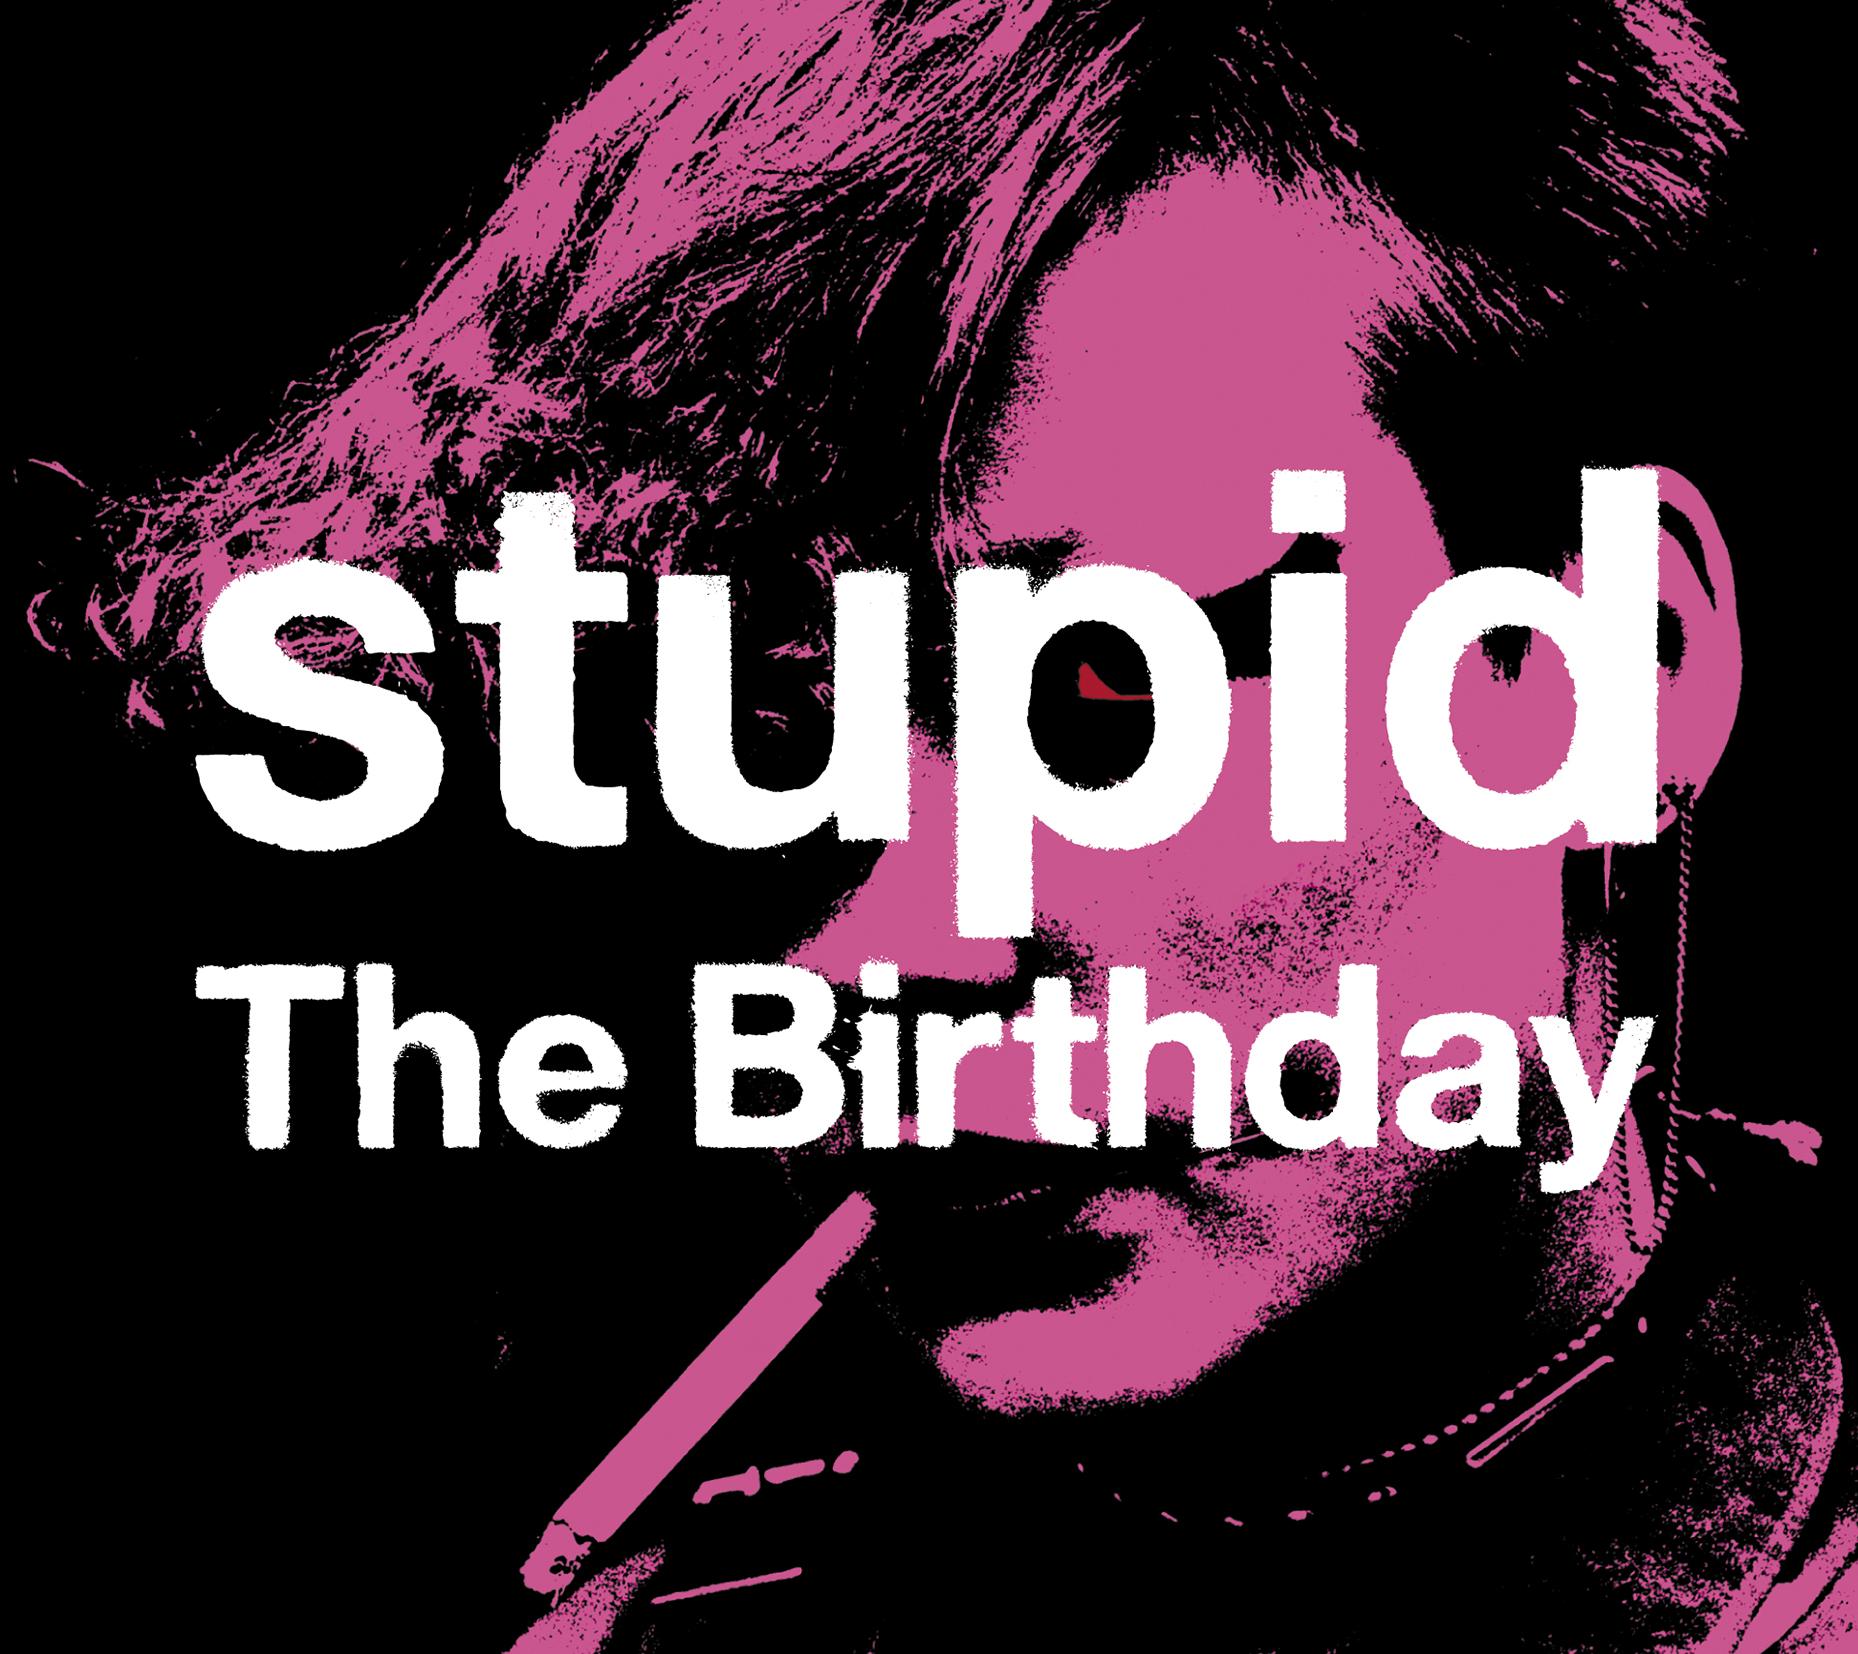 The Birthday 「stupid」